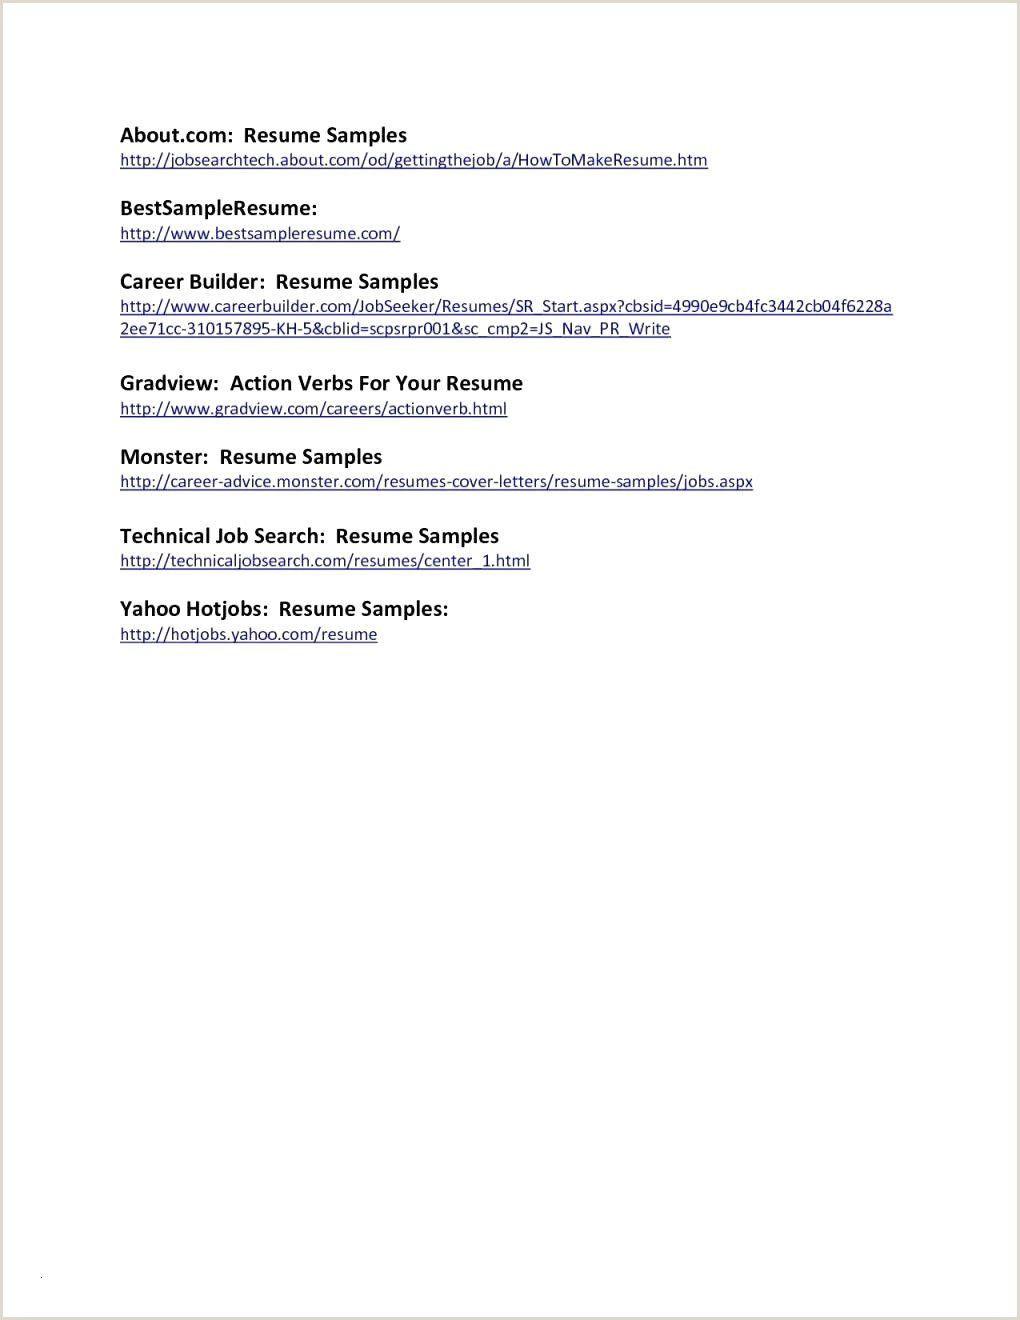 Lebenslauf Muster Einfach In 2020 Resume Writing Services Resume Objective Examples Resume Examples